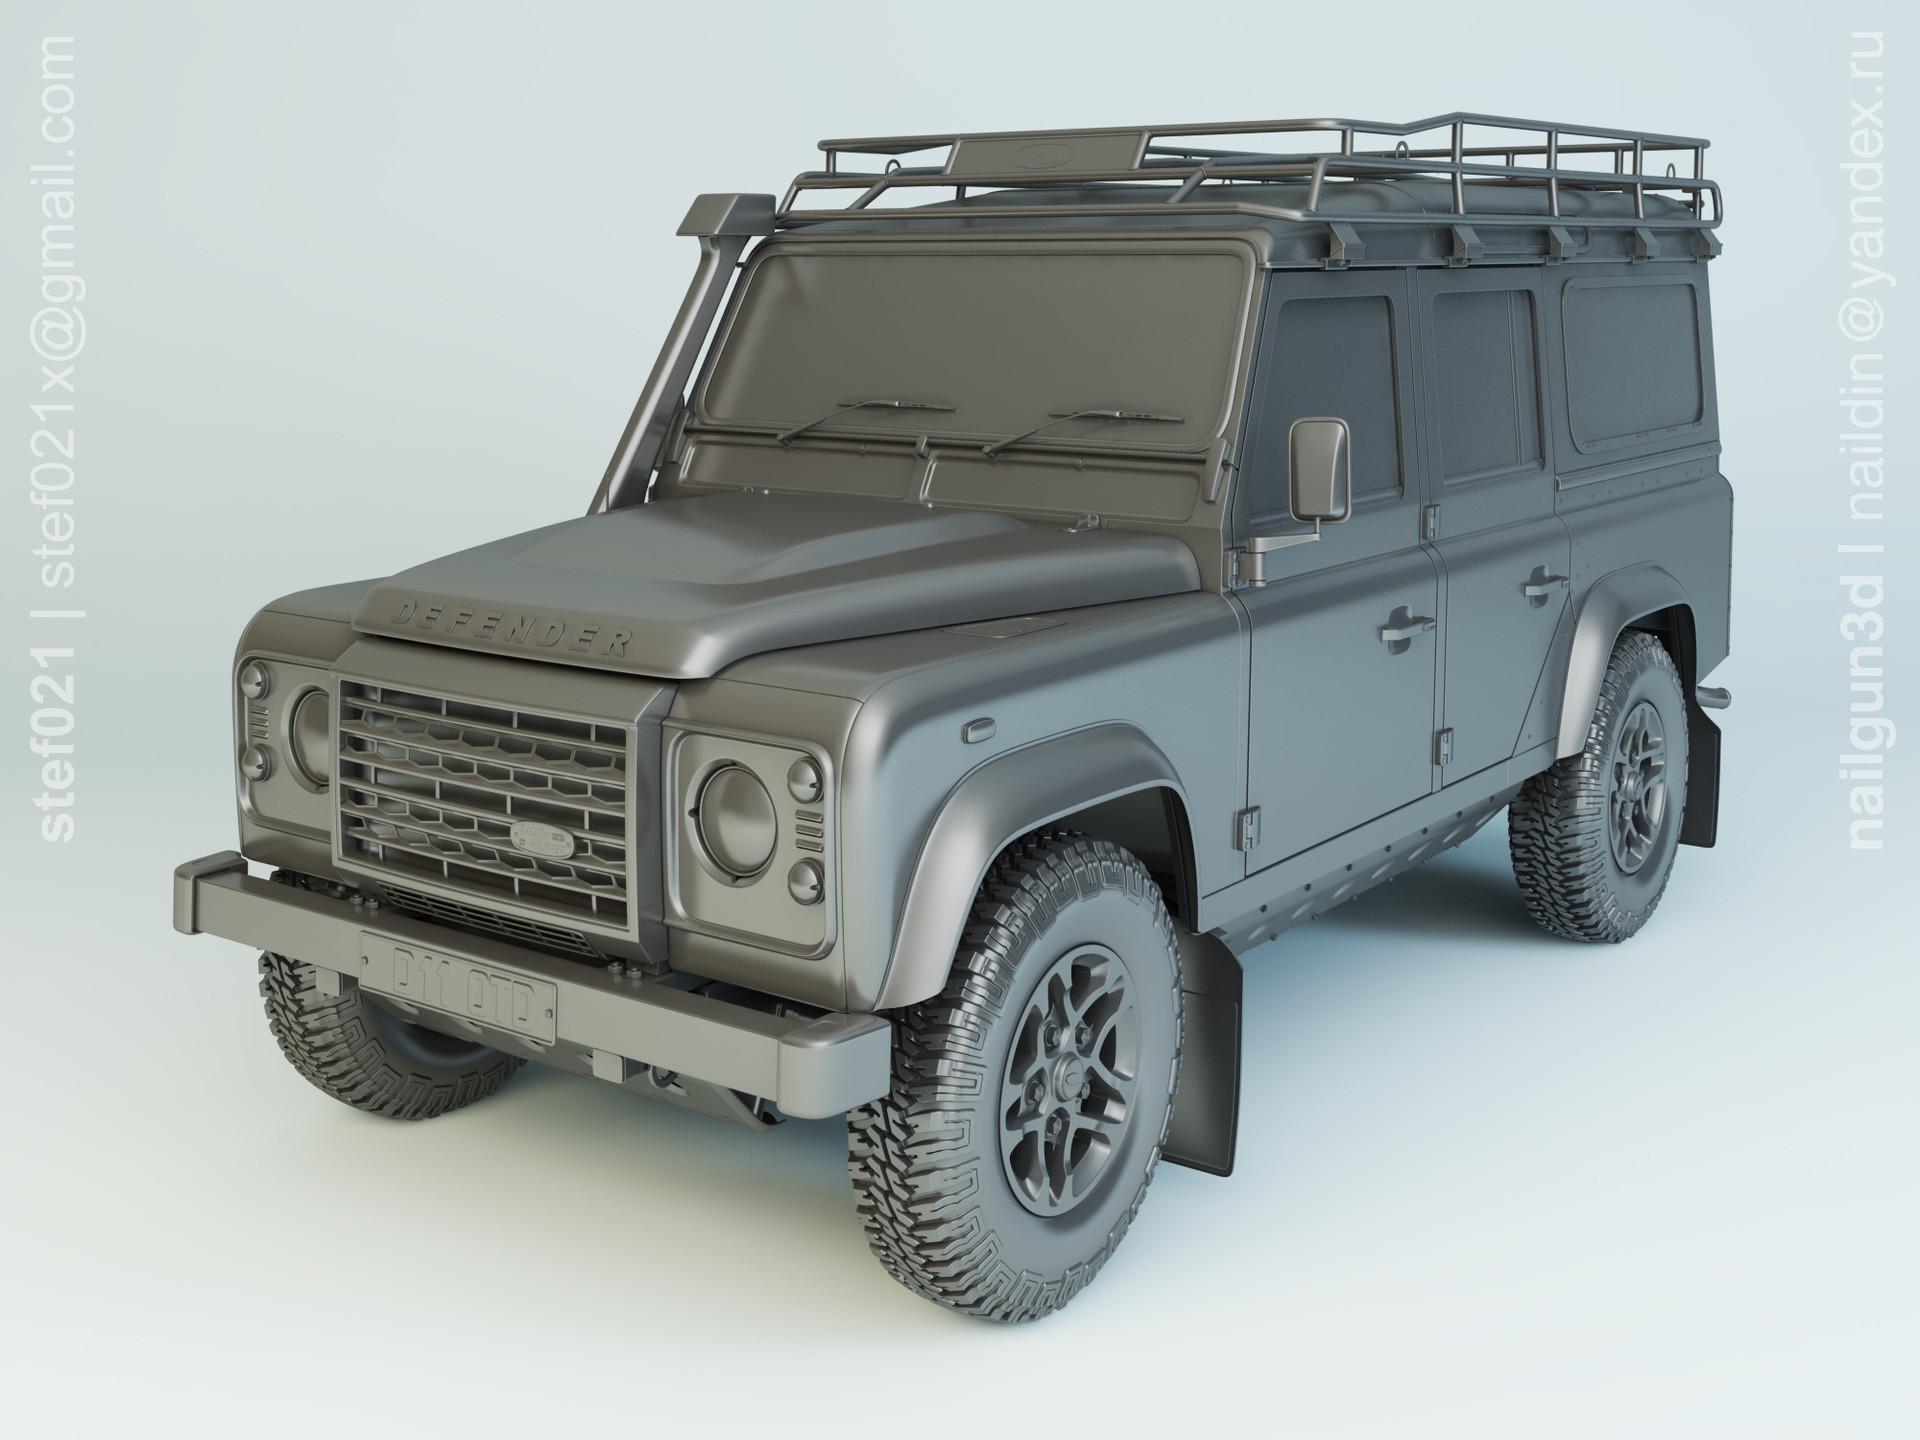 Nail khusnutdinov a0014 010 land rover defender 110 2015 modelling 0